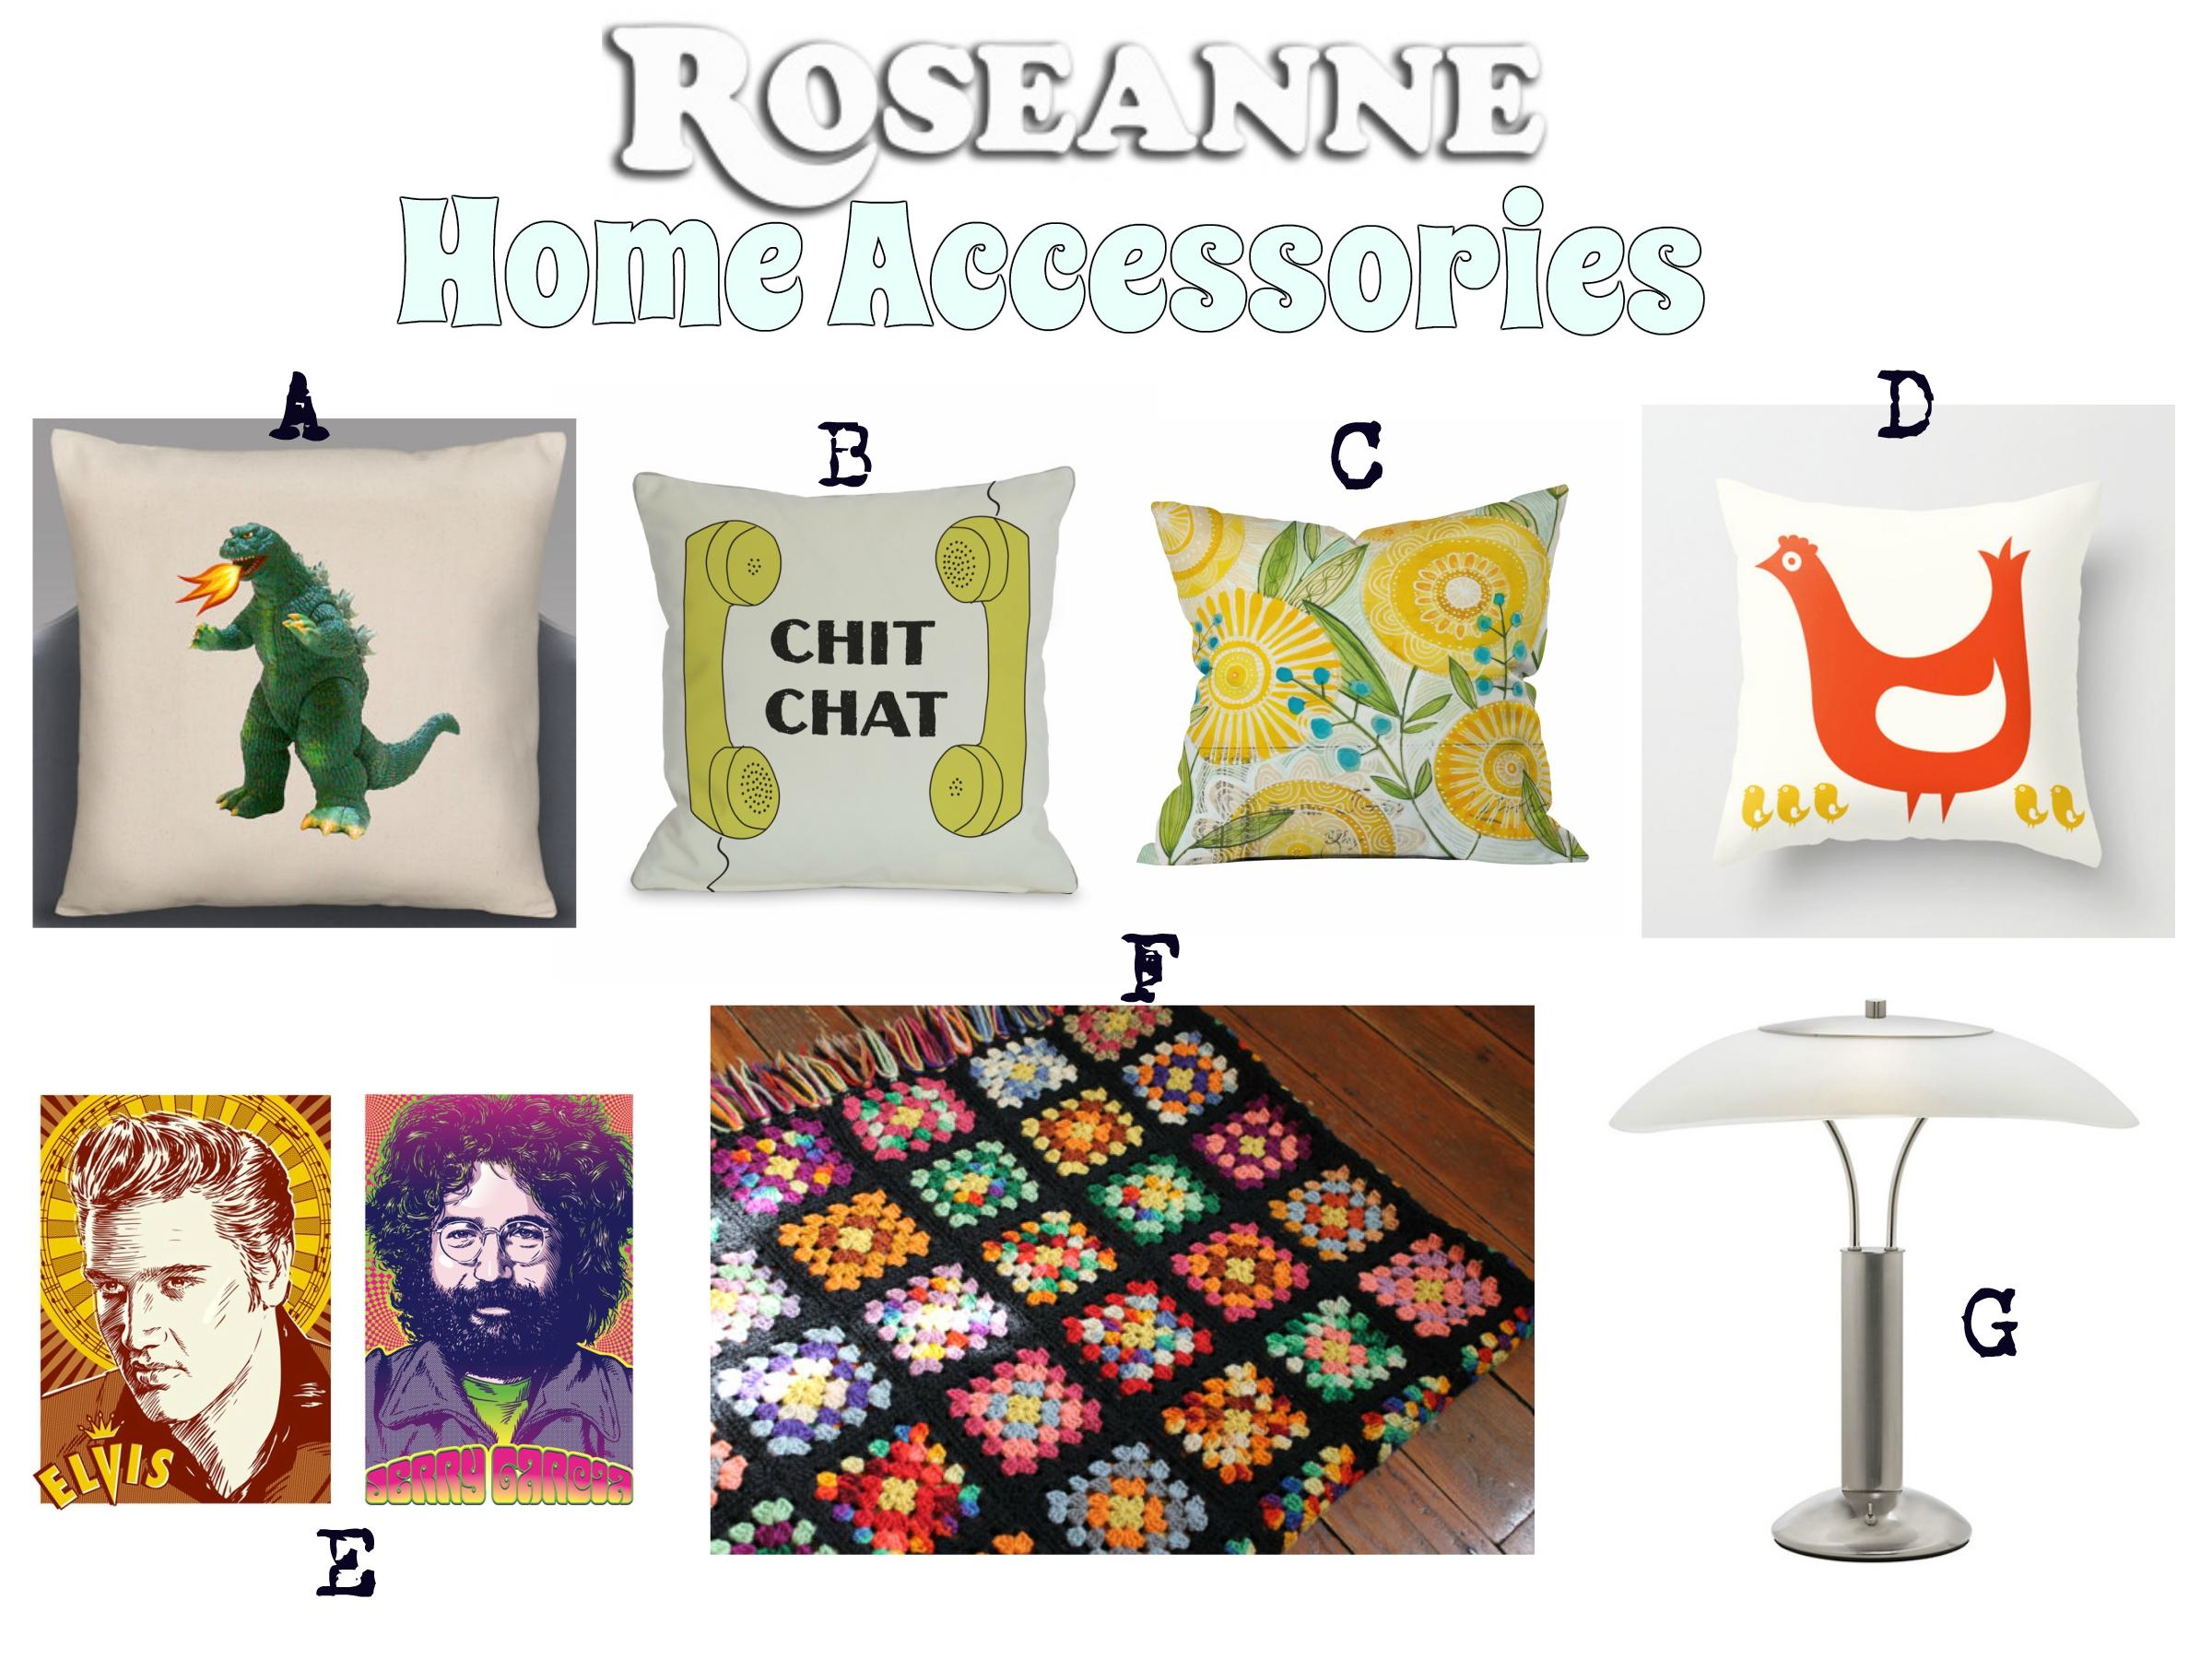 Roseanneaccessories